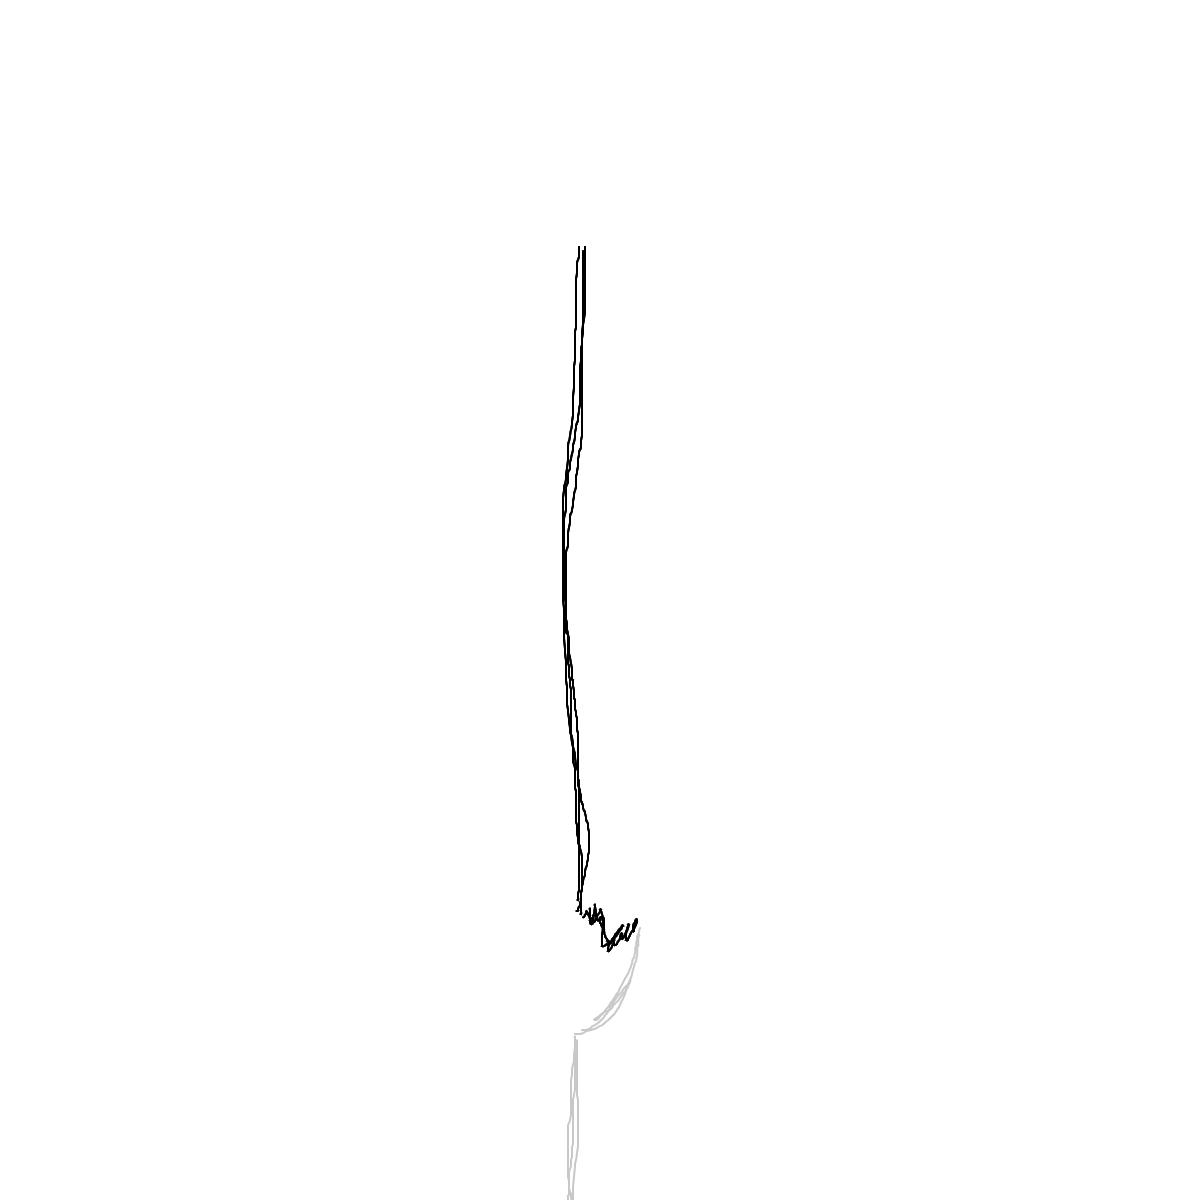 BAAAM drawing#10688 lat:51.0363311767578100lng: -114.0525131225586000